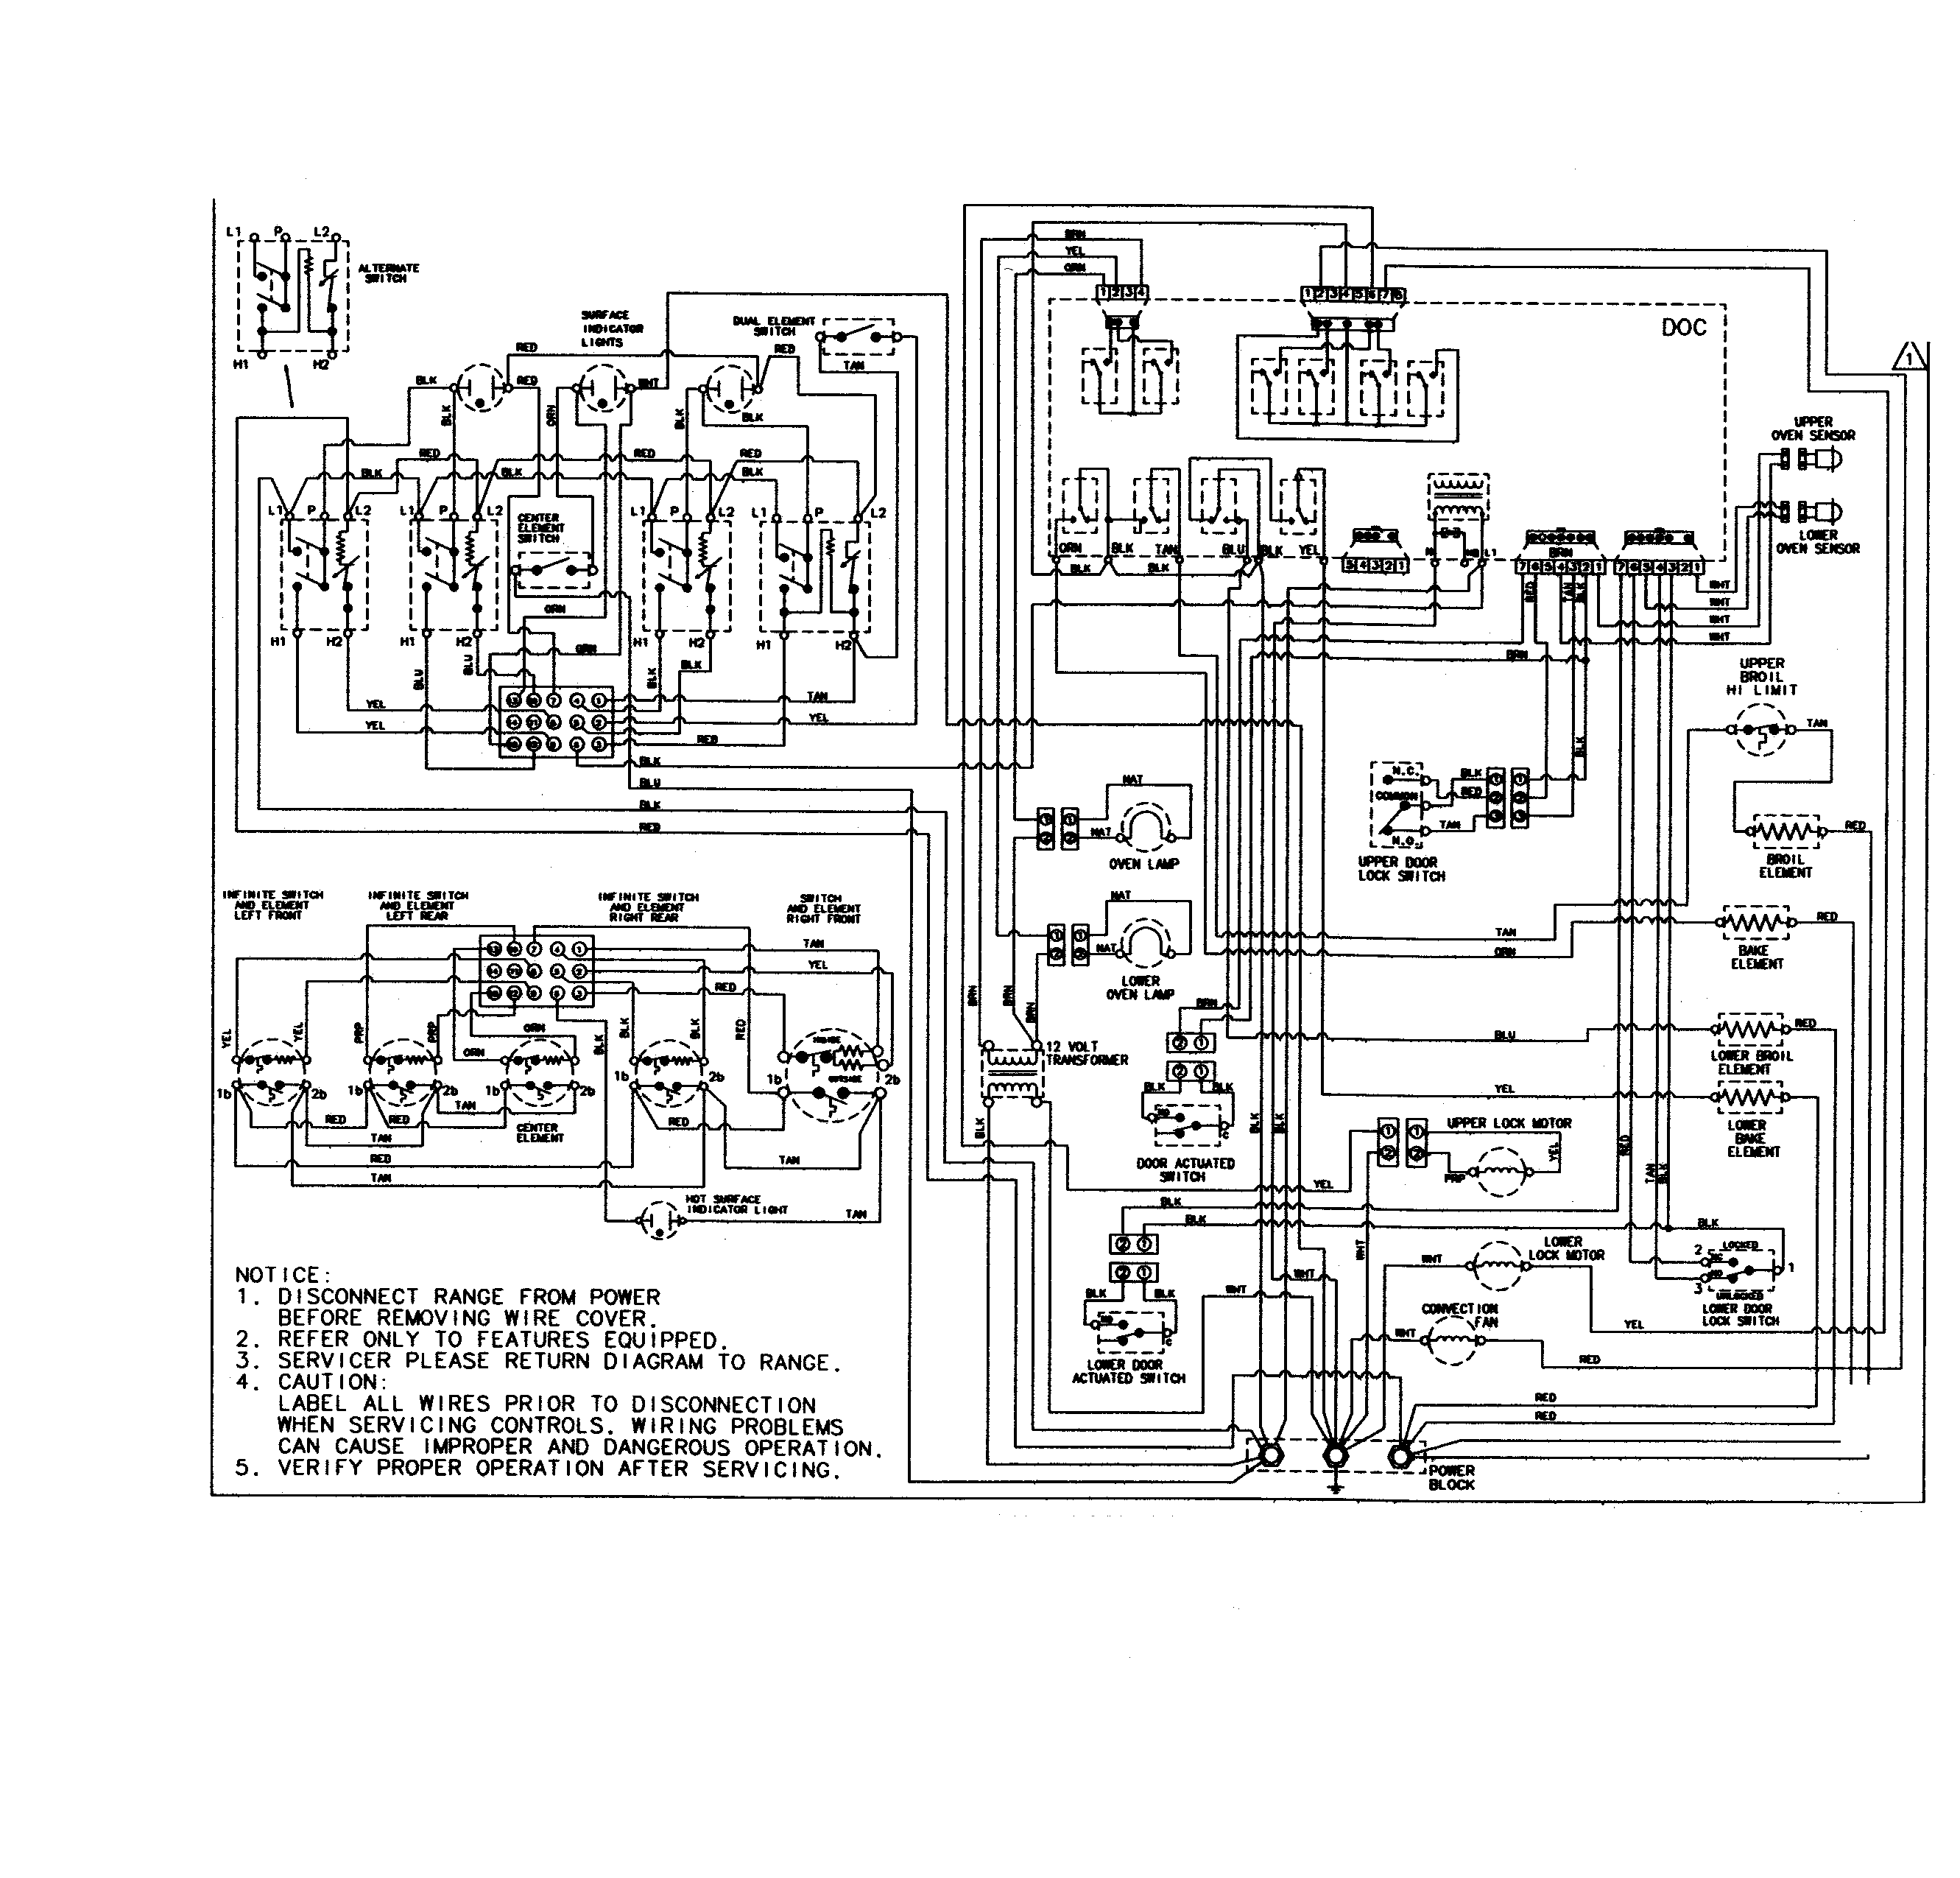 Electric Double Oven Wiring Diagram 2015 Bmw M3 Engine Component Diagram Air Bag Yenpancane Jeanjaures37 Fr